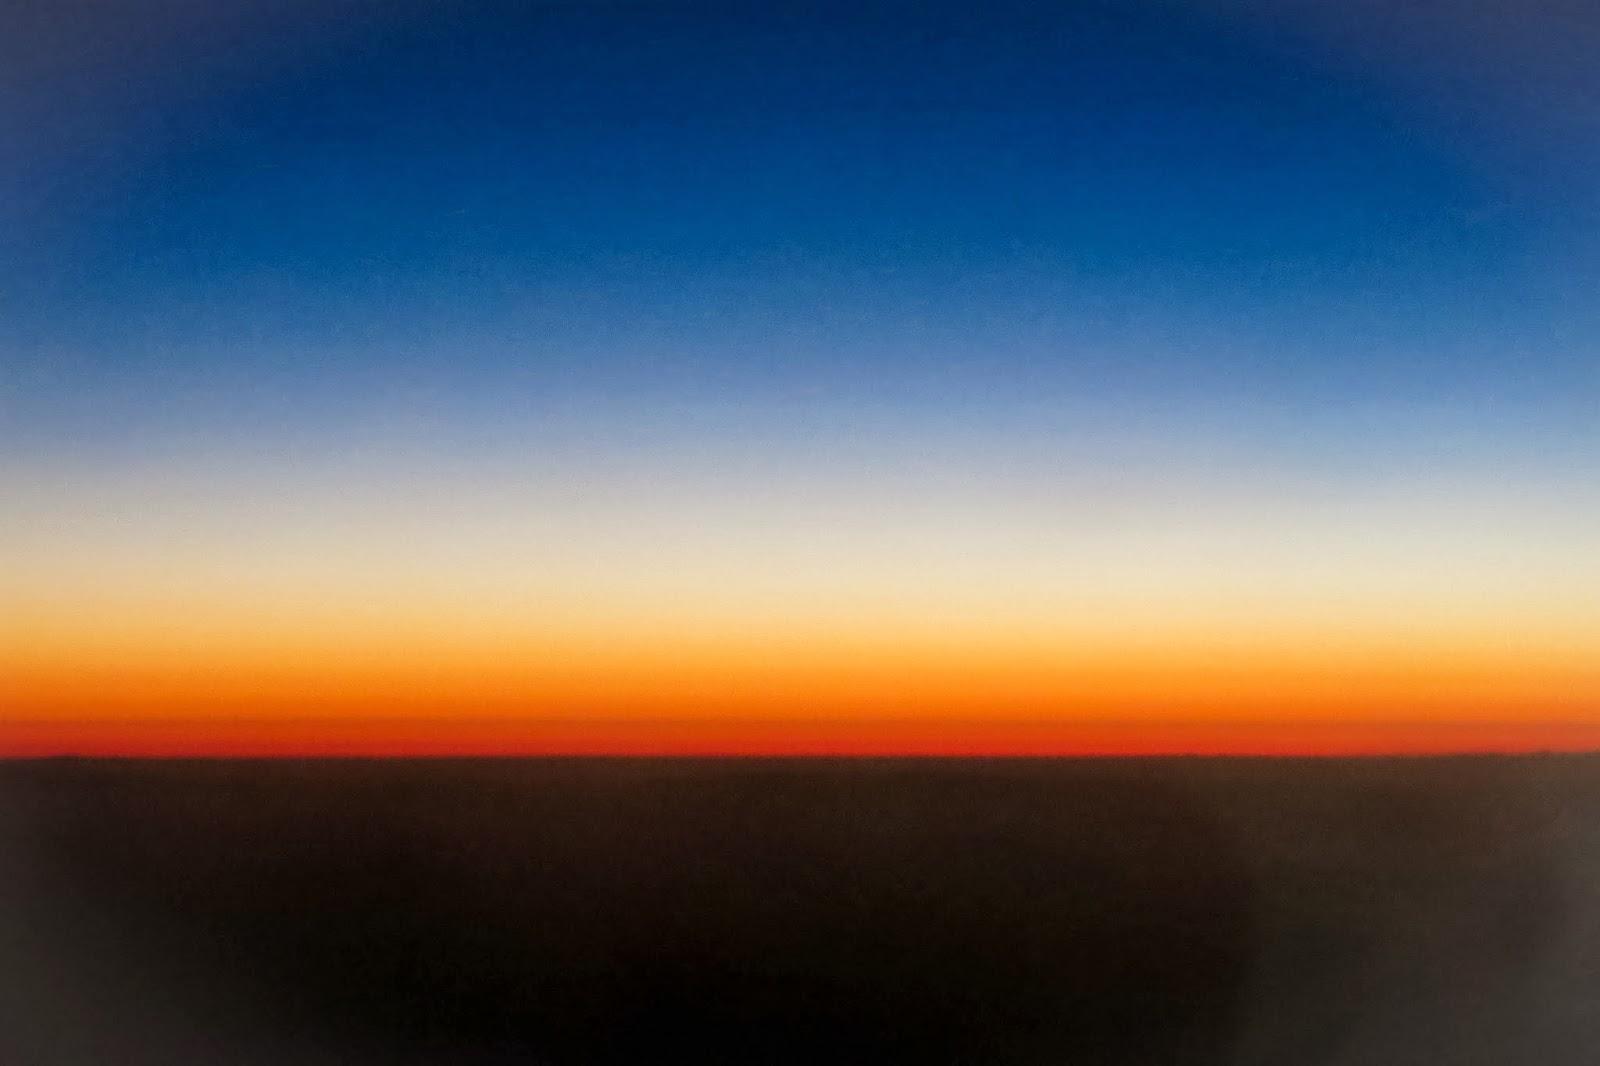 sunrise,avion,plane